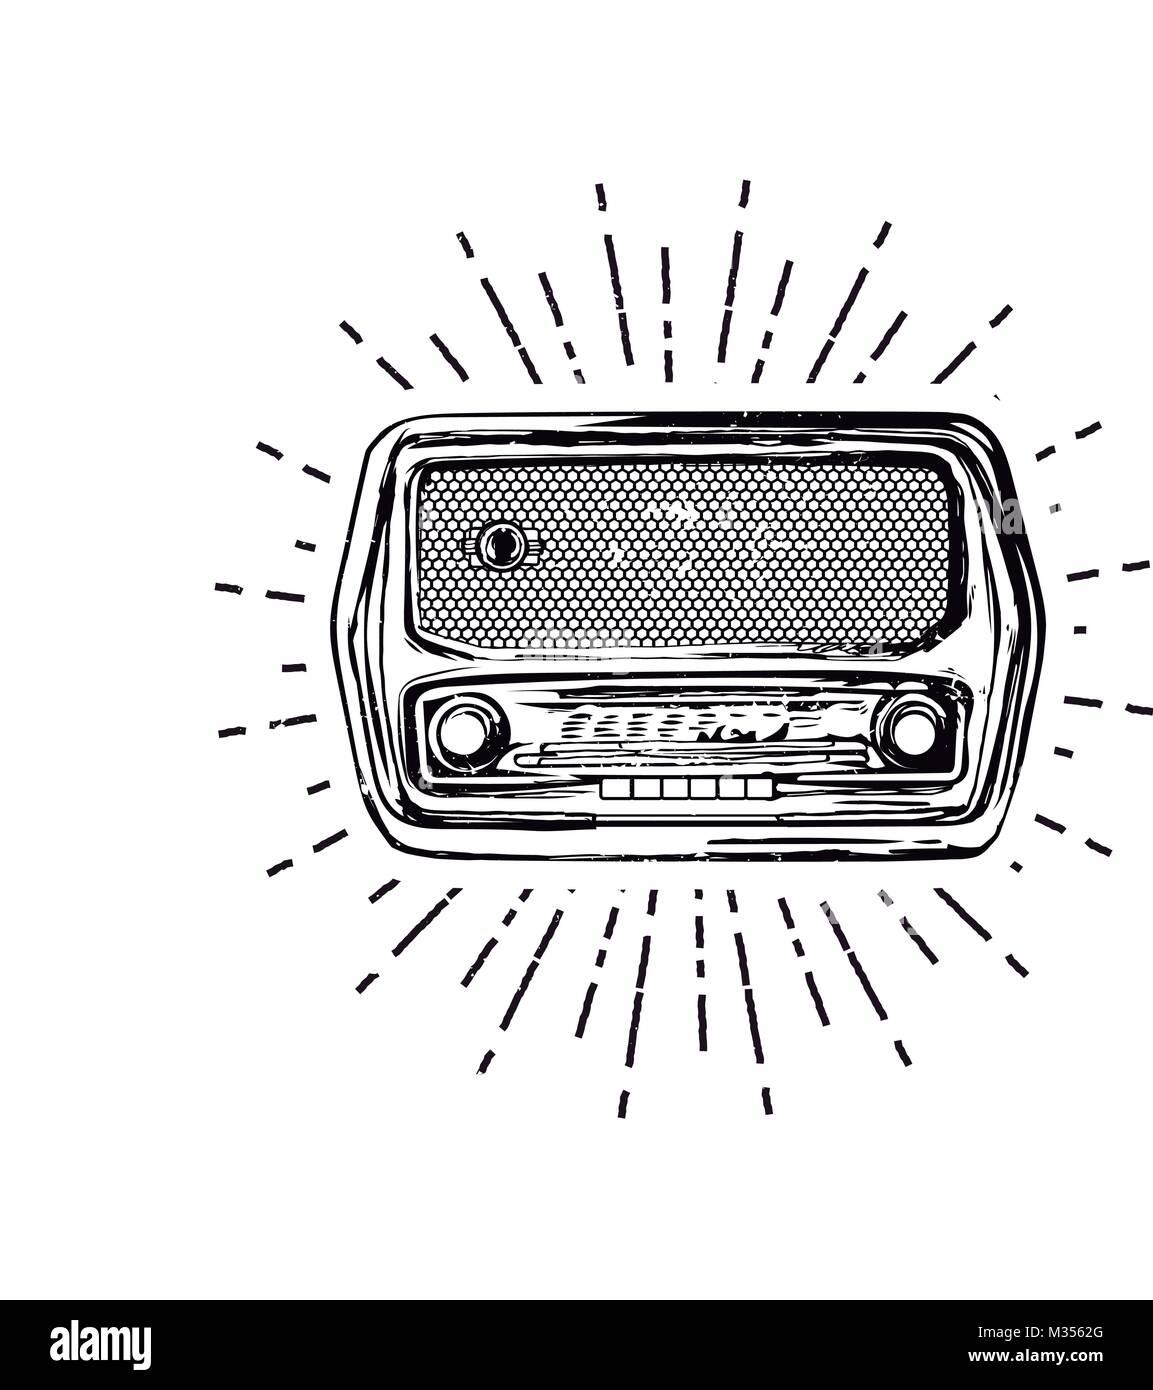 Old vintage radio Photo Stock